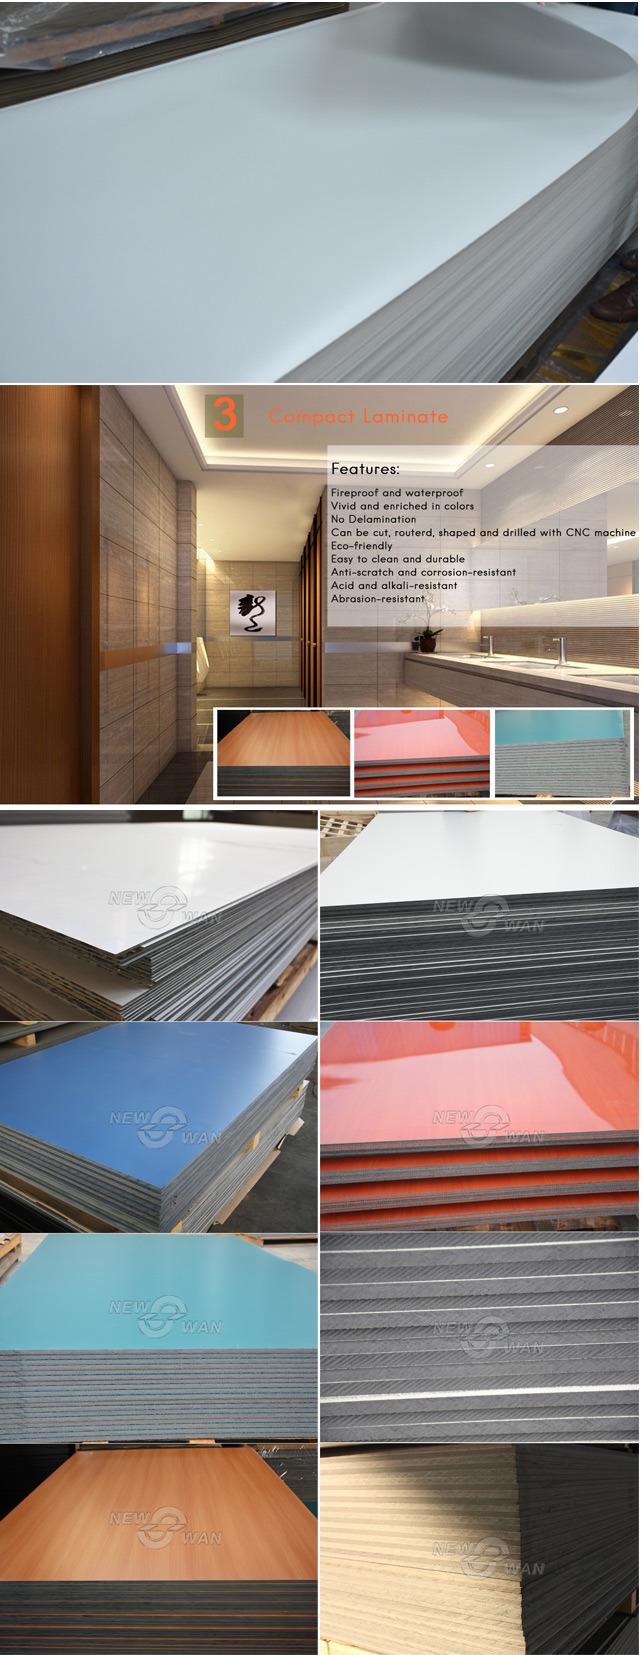 stratifi haute pression formica compact hpl stratifi haute pression formica compact hpl. Black Bedroom Furniture Sets. Home Design Ideas